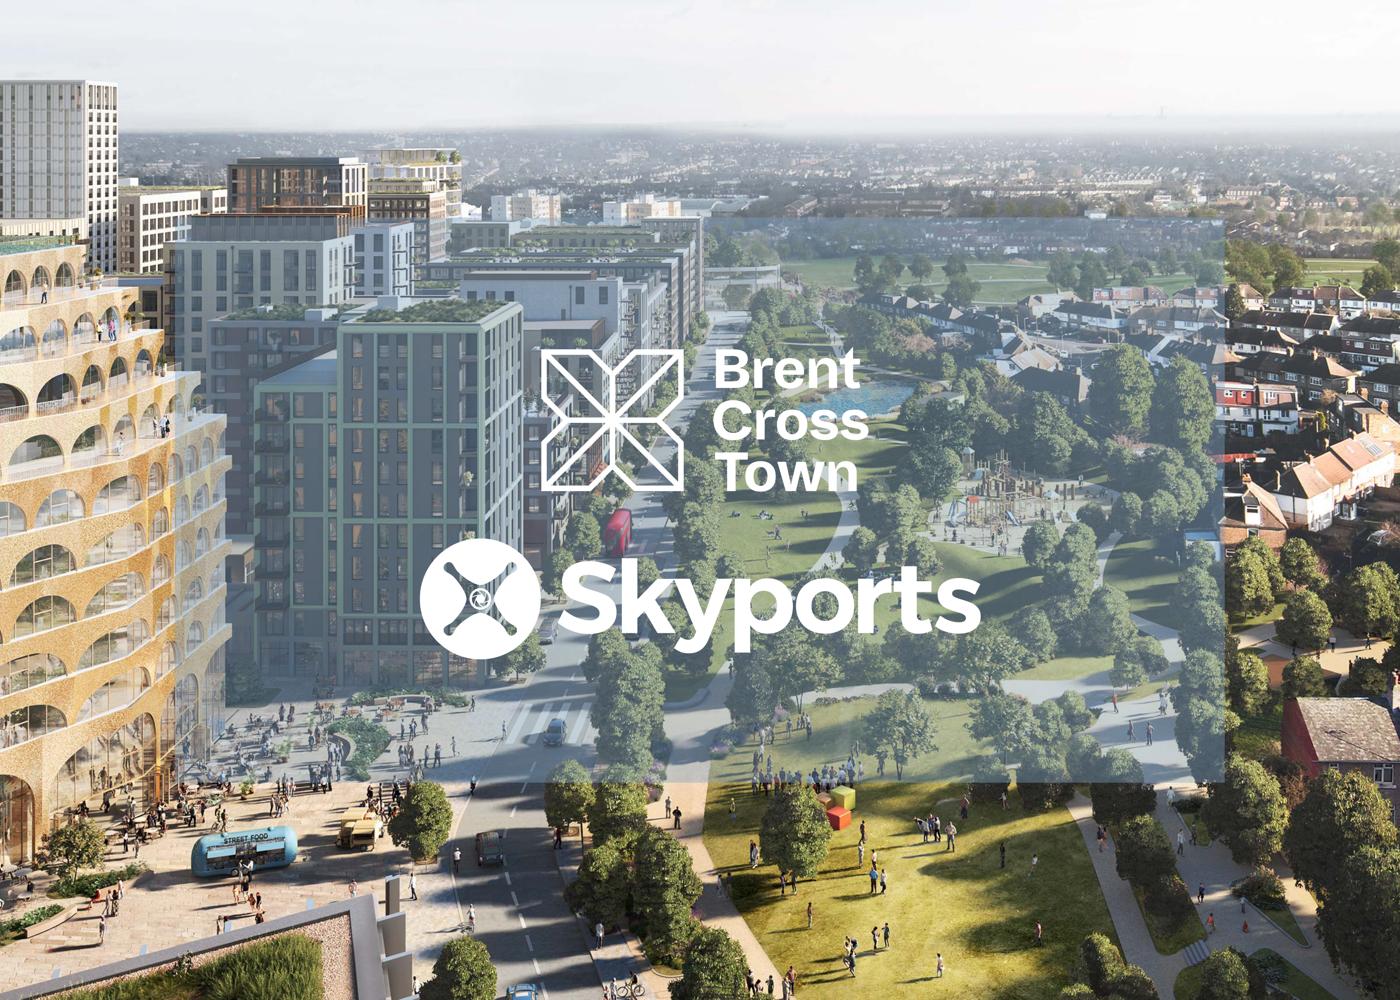 Skyports Brent Cross